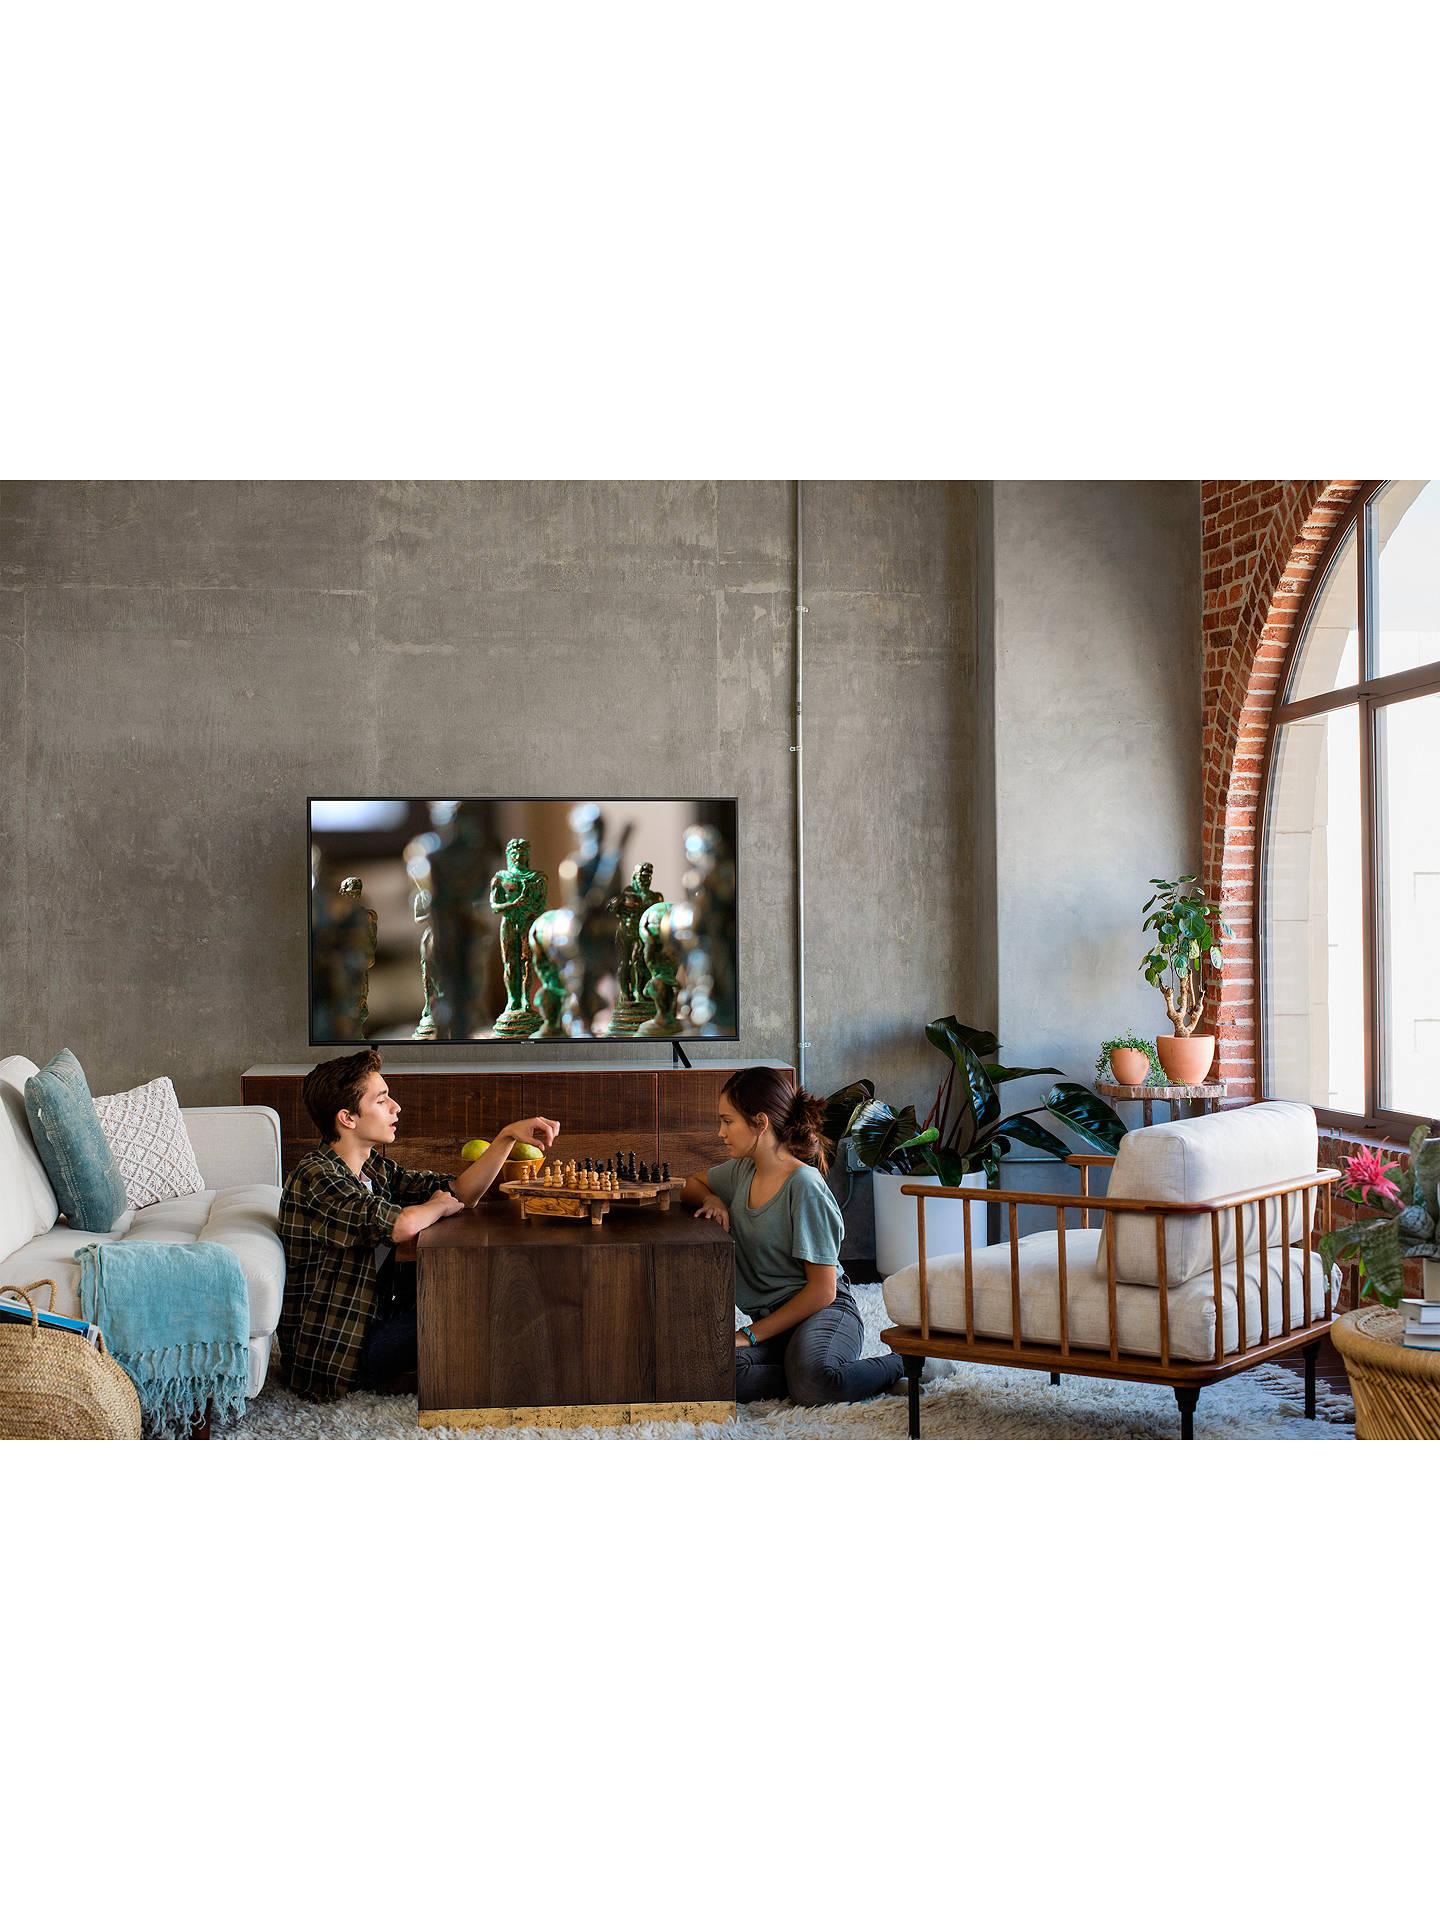 Samsung UE43NU7020 HDR 4K Ultra HD Smart TV, 43